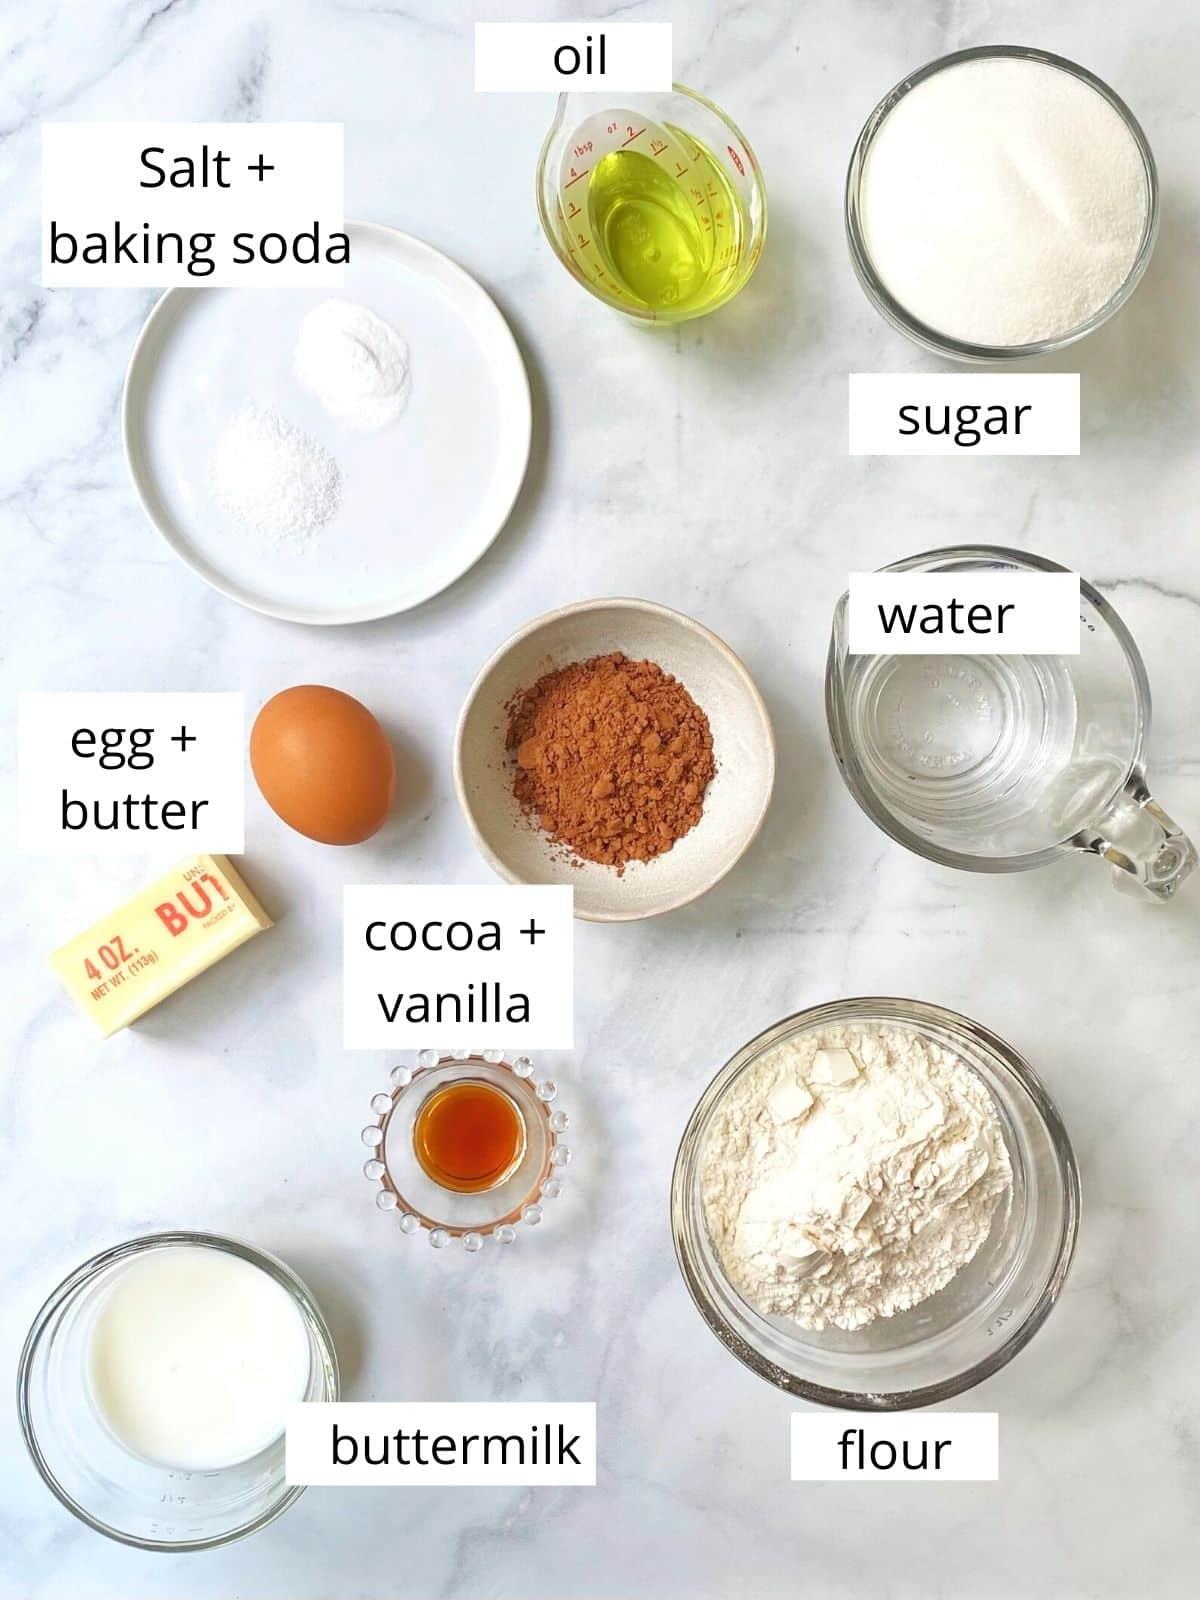 array of cake ingredients - flour, sugar, oil, butter, buttermilk, cocoa powder, vanilla, egg, salt, and baking soda